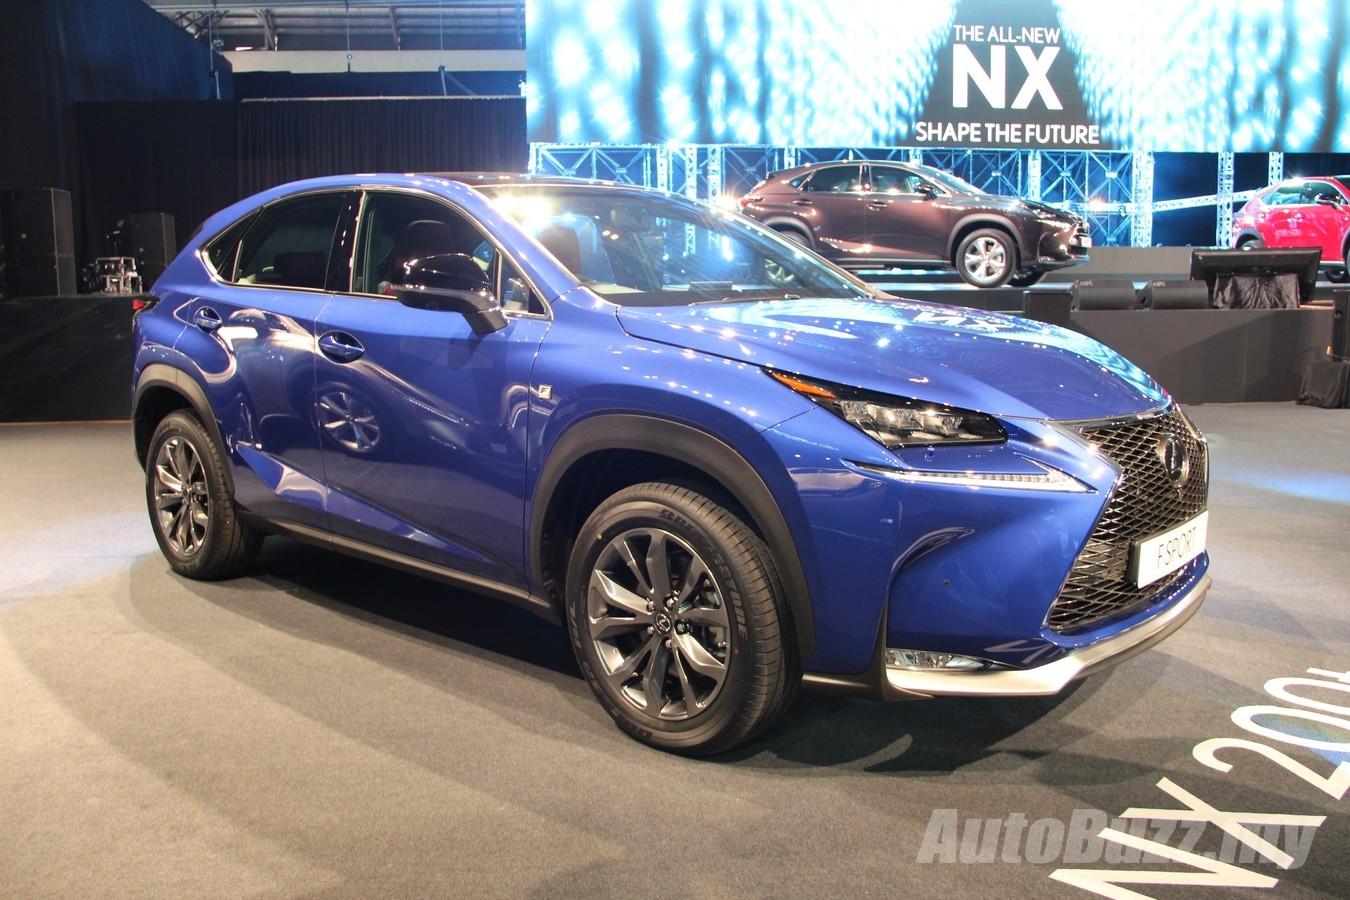 Lexus Malaysia recalls 255 Lexus NX over potential ABS